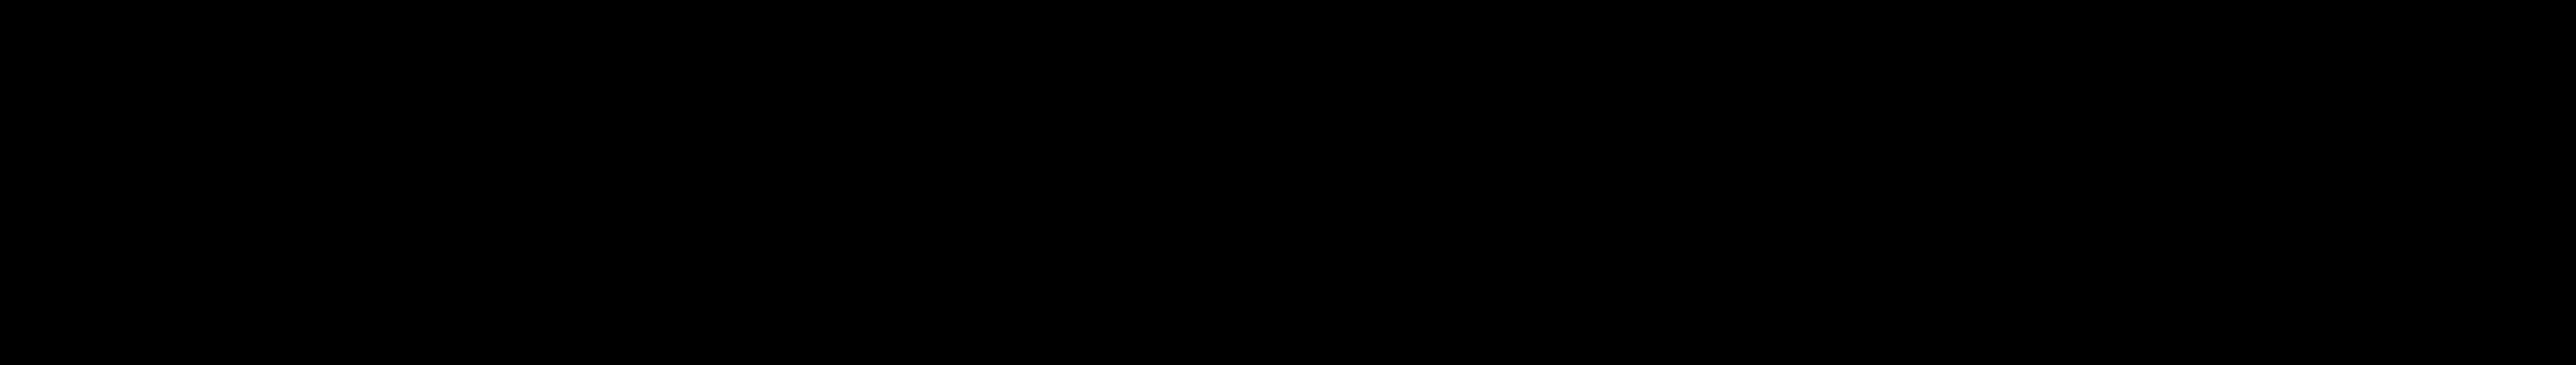 blackrock logo - BlackRock Logo